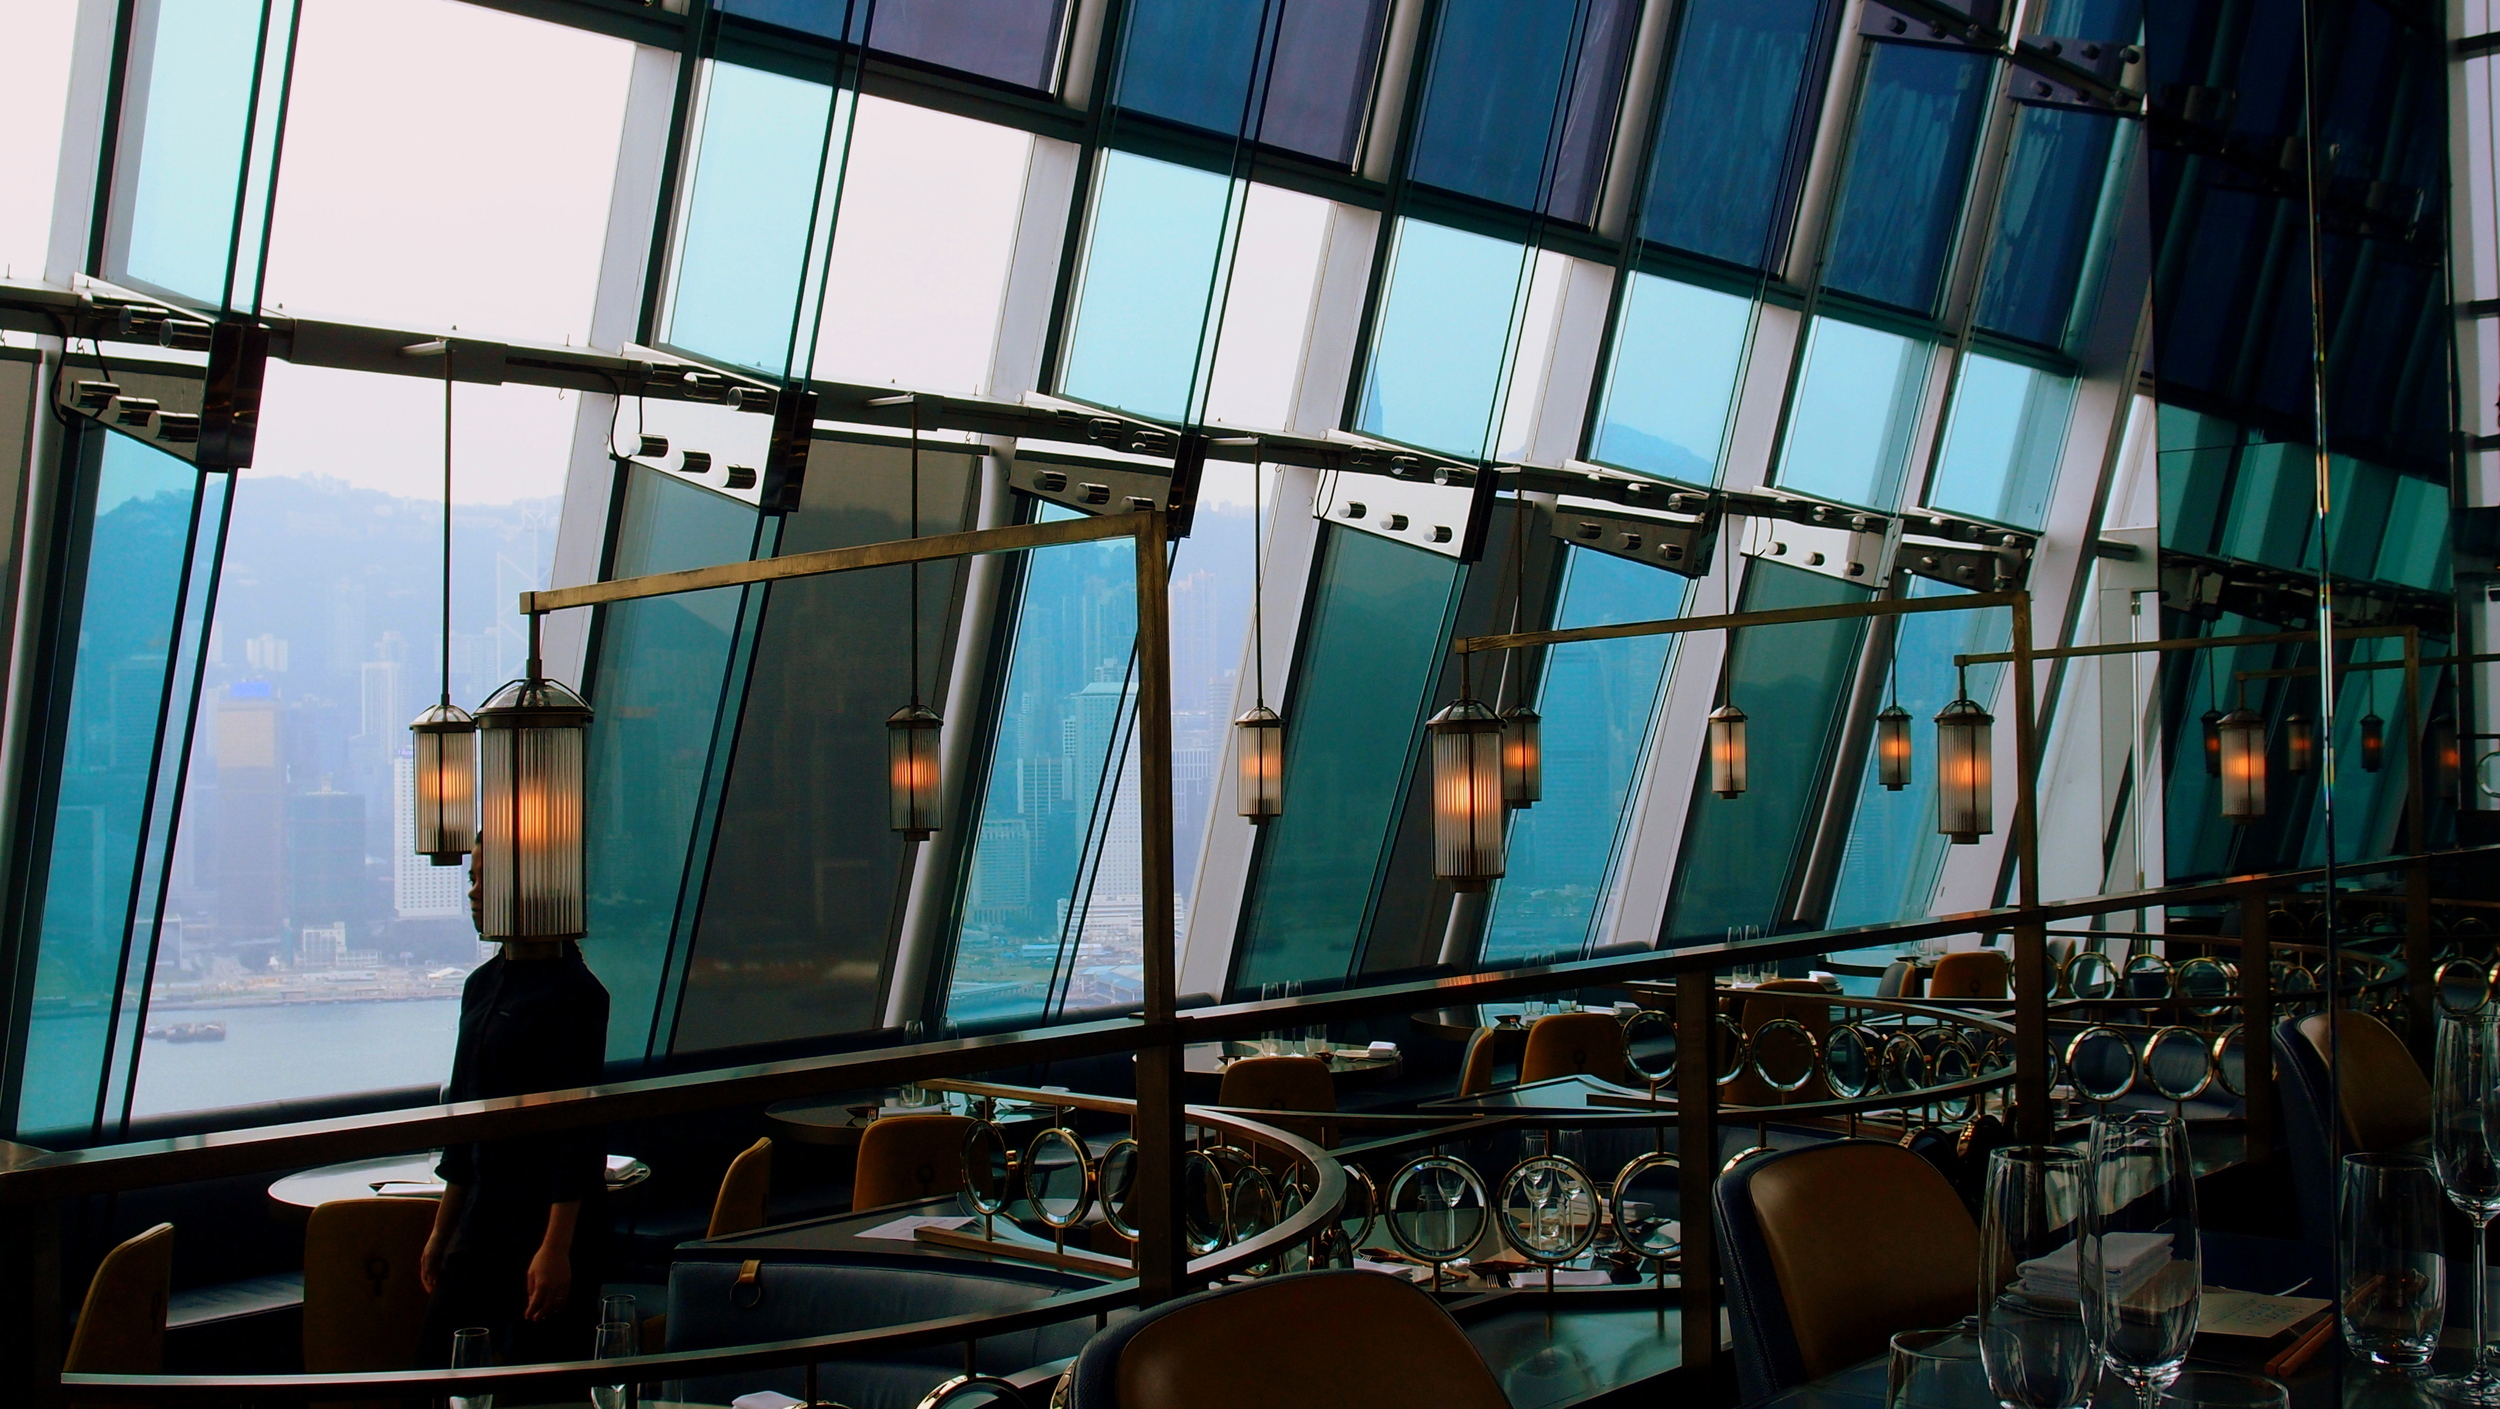 A pretty decent restaurant by all accounts, the Aqua restaurant 29/f One Peking in TST, Kowloon